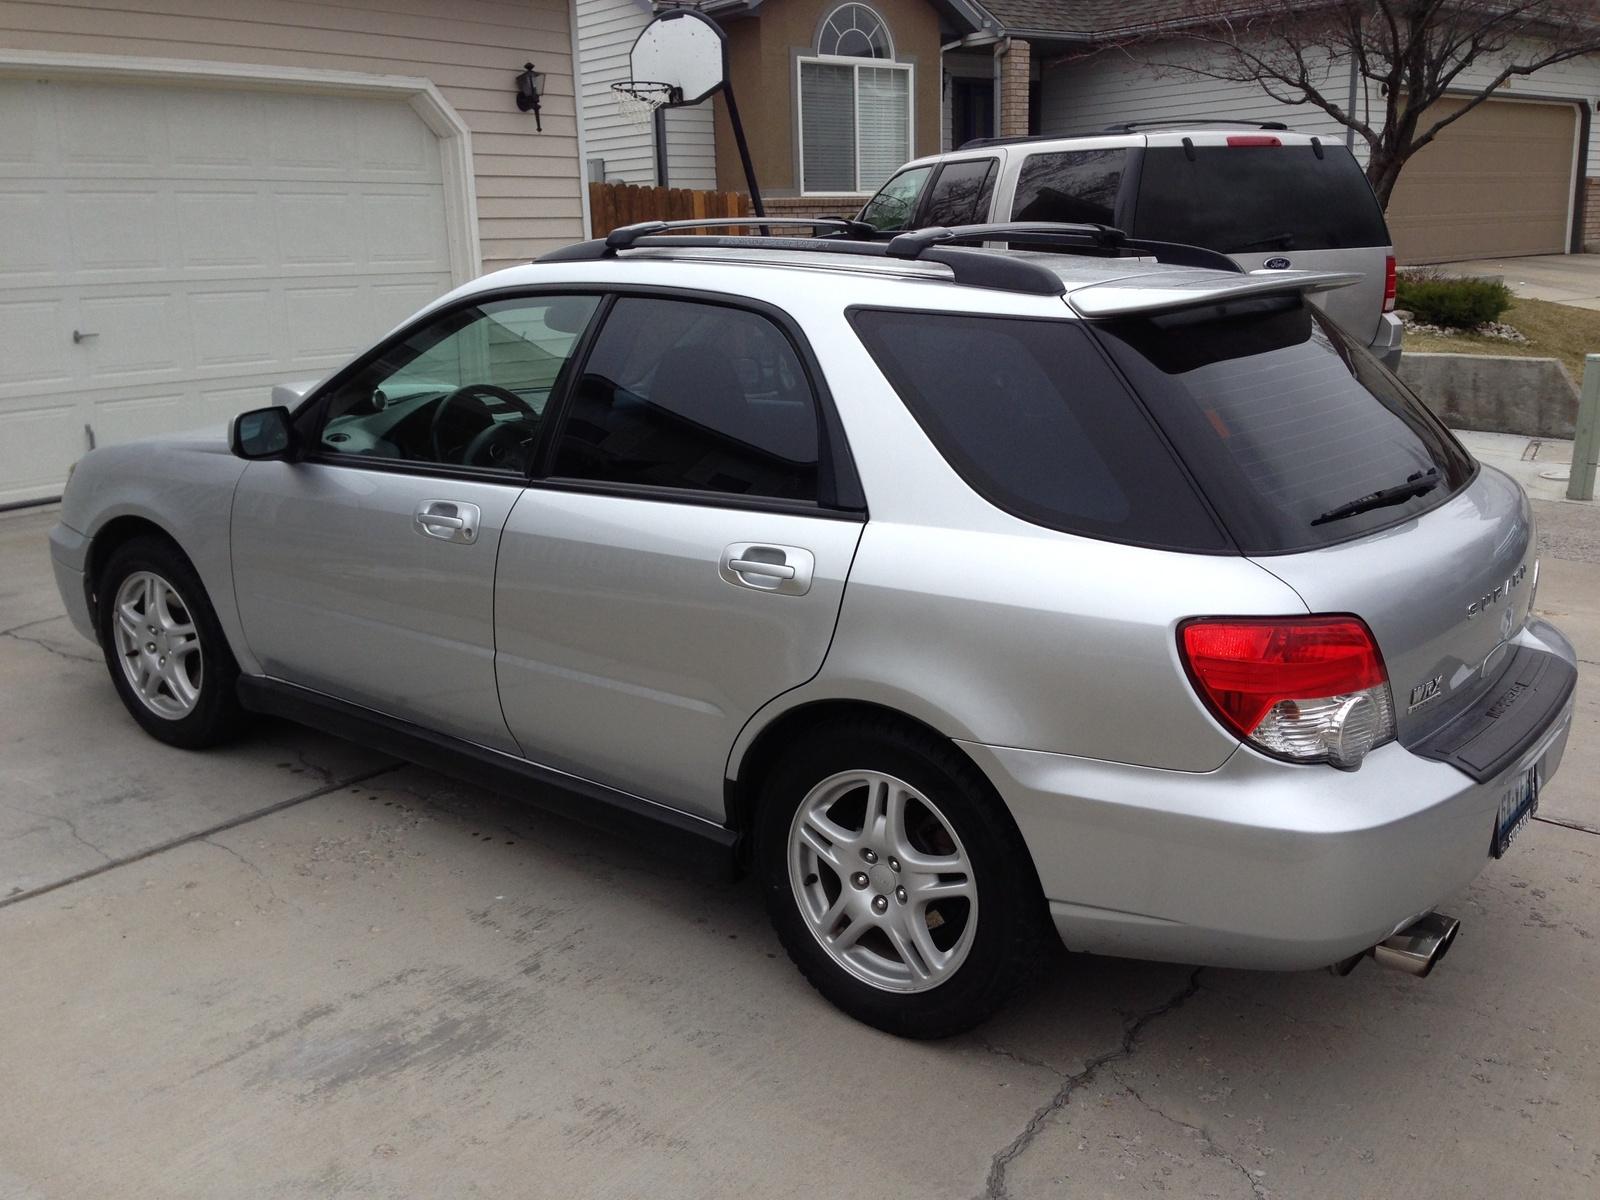 Subaru Wrx Sti 0-60 >> 2004 Subaru Impreza WRX STi - Overview - CarGurus